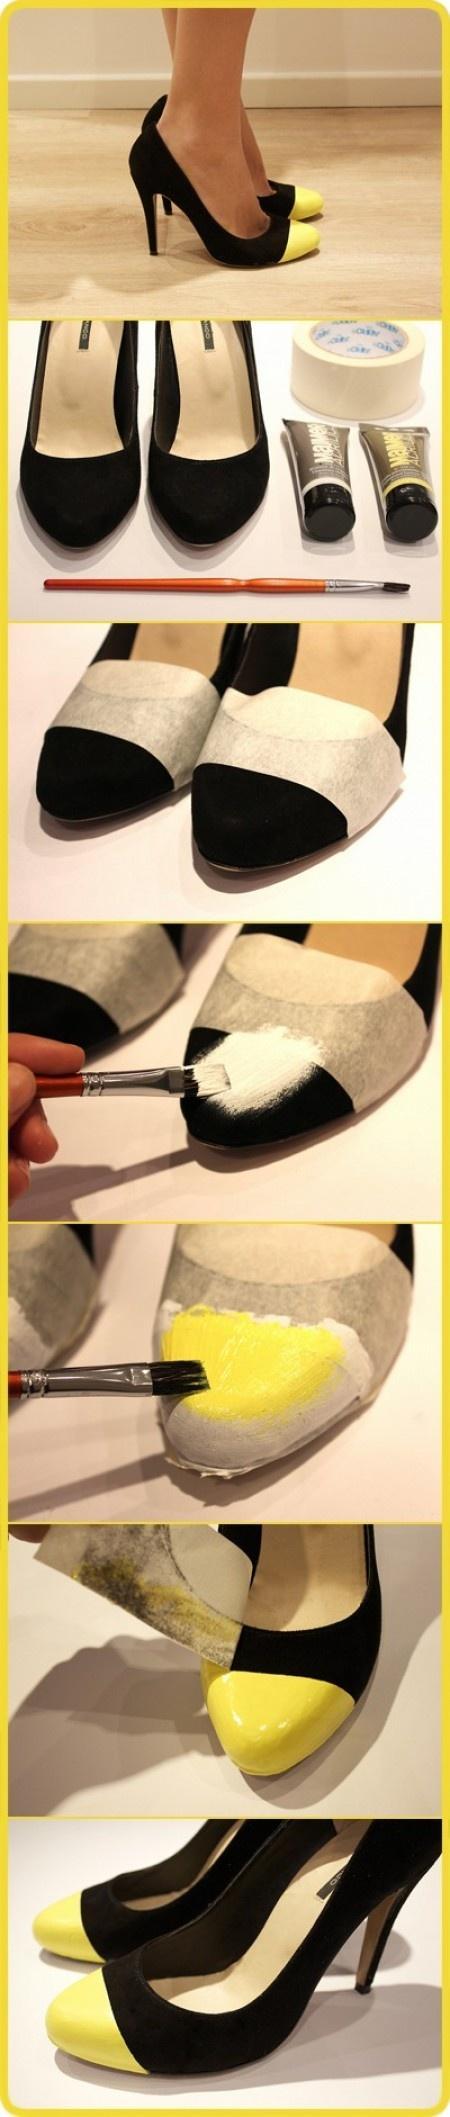 Рукава для туфель своими руками 90